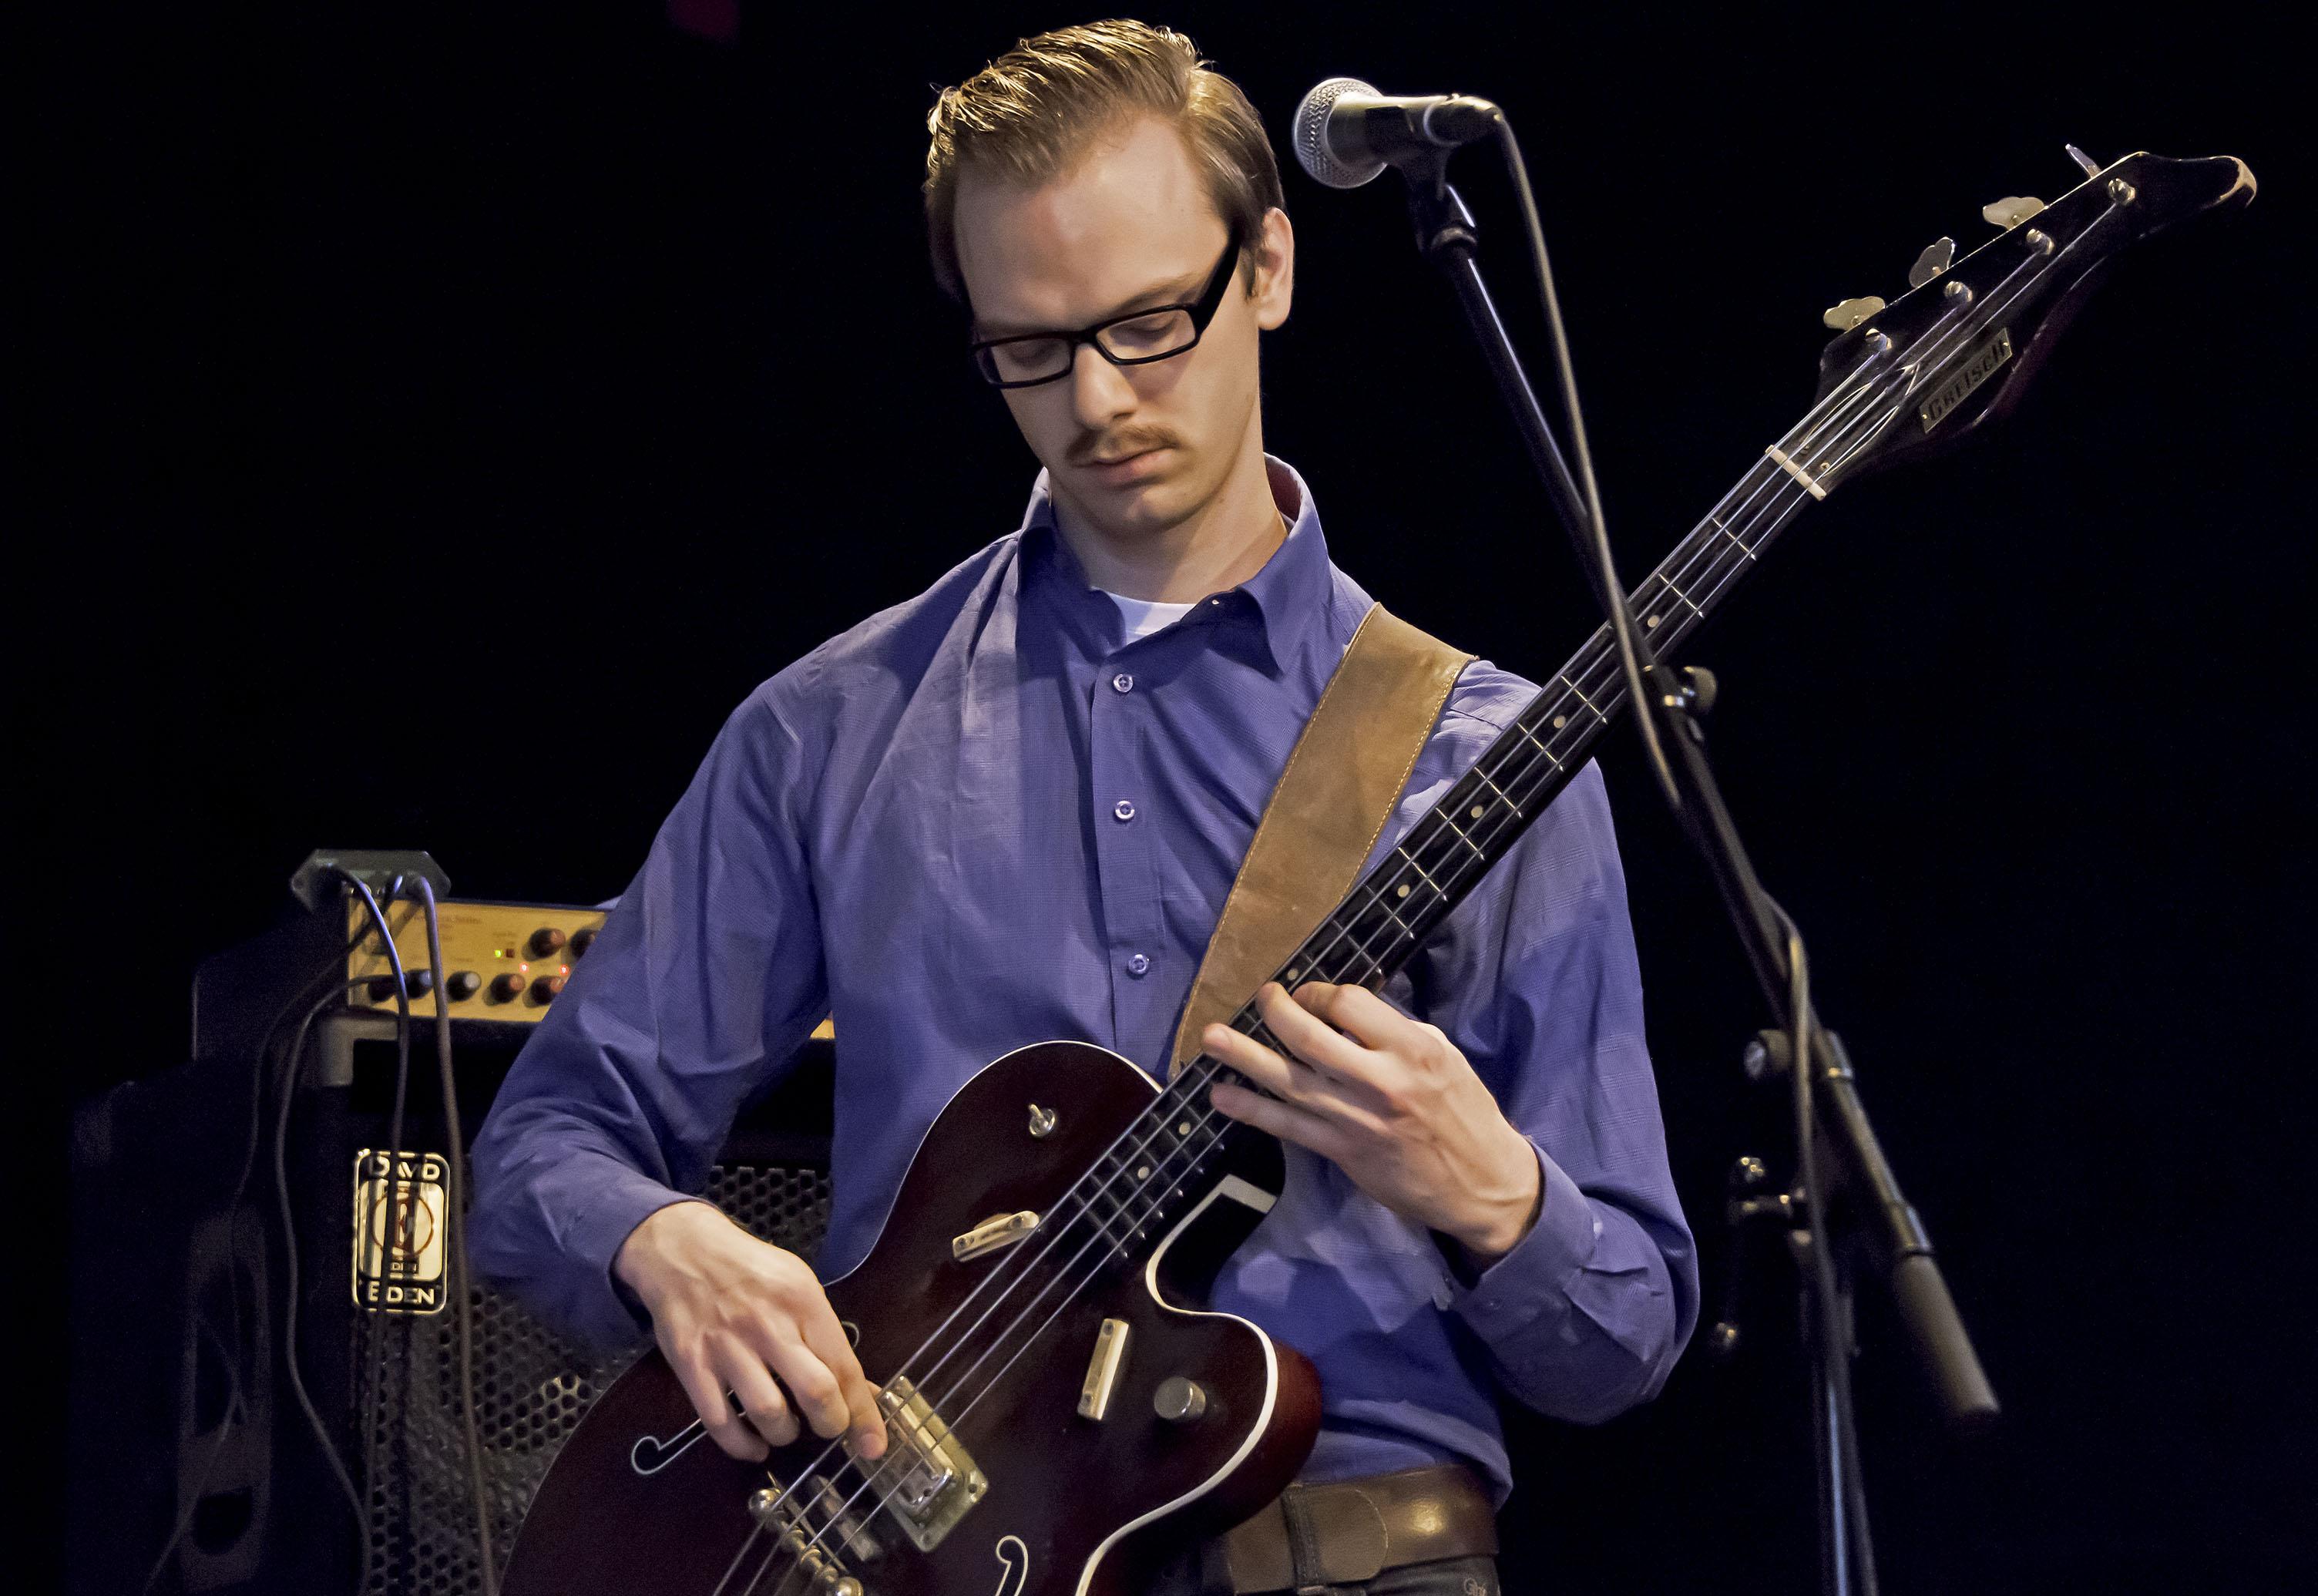 Dan Peter Sundland, the Jazz Summit 2012